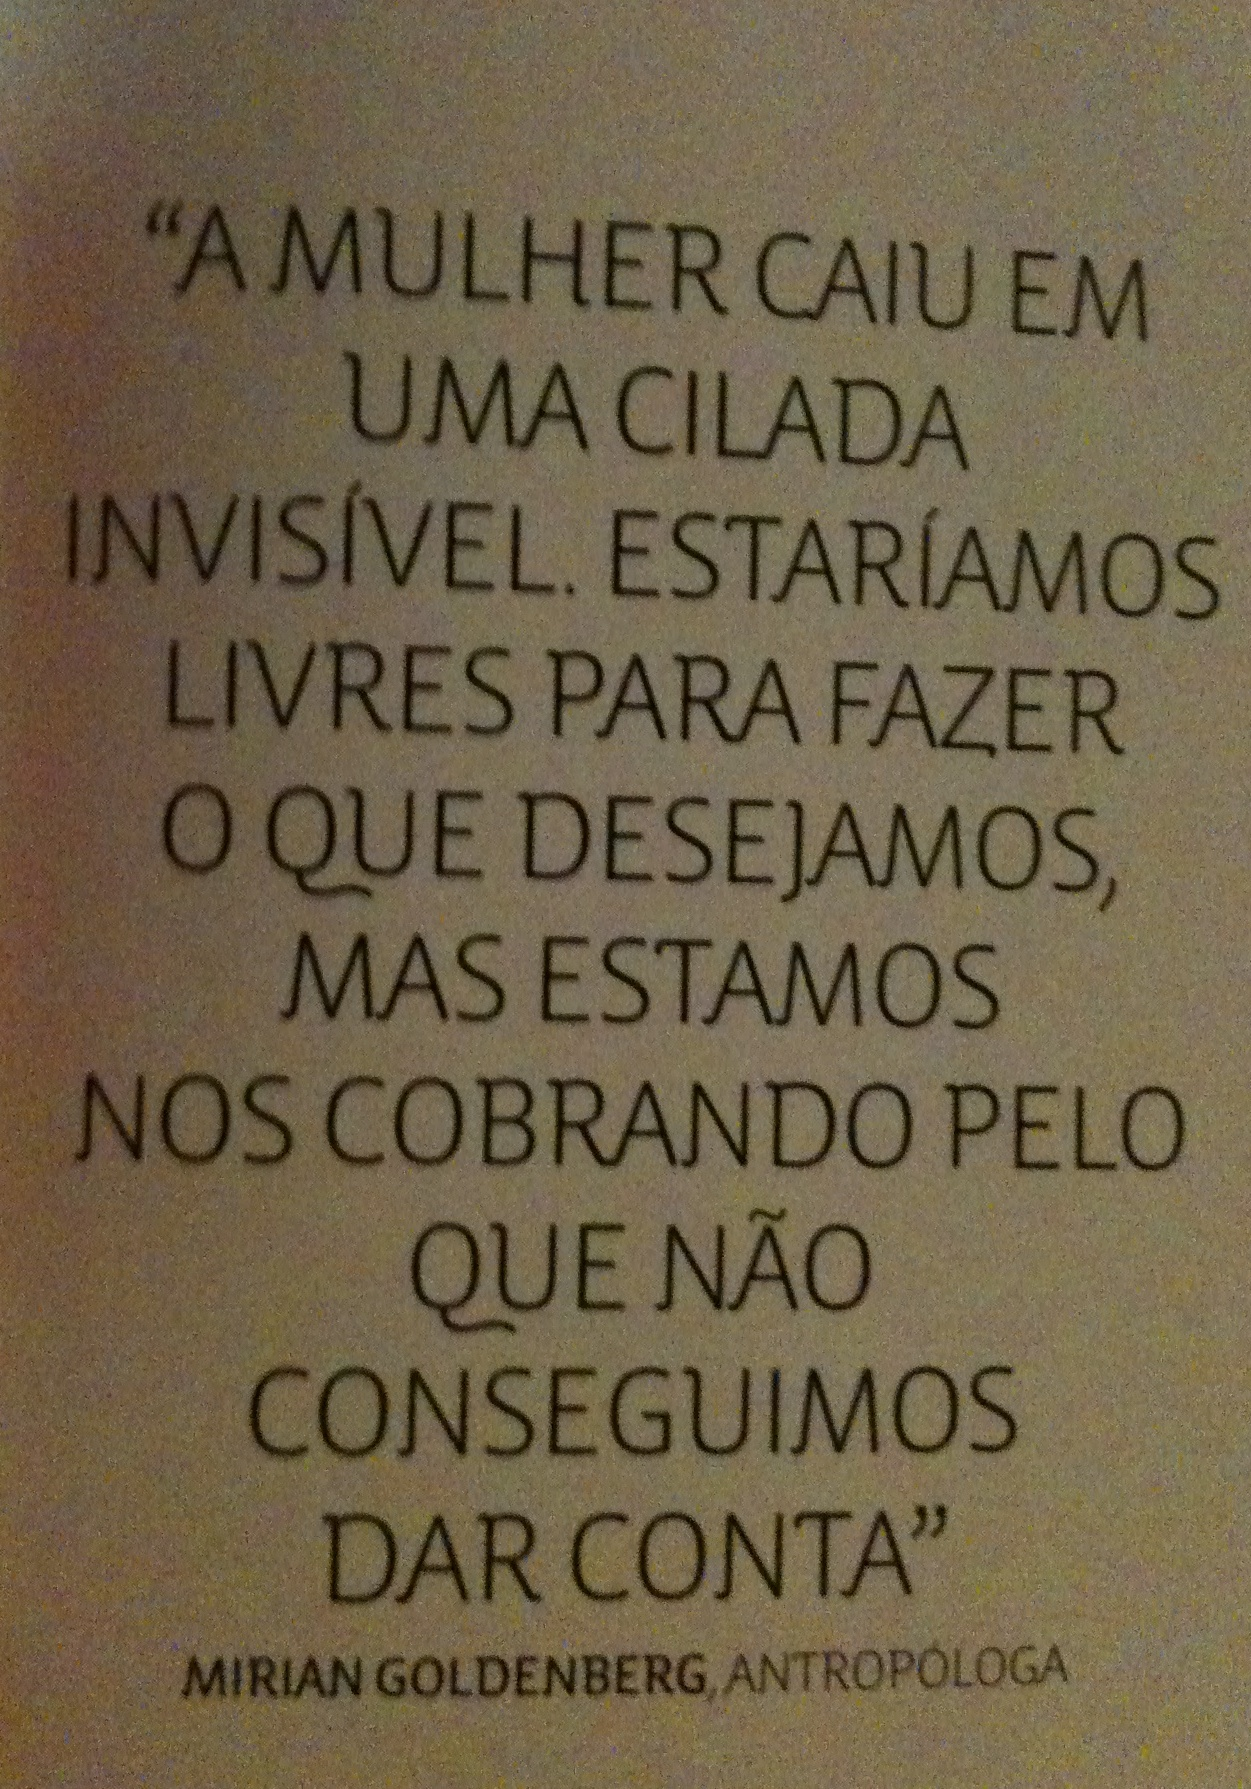 Psicologando Bóra Refletir Juliana Baron Pinheiro Página 5